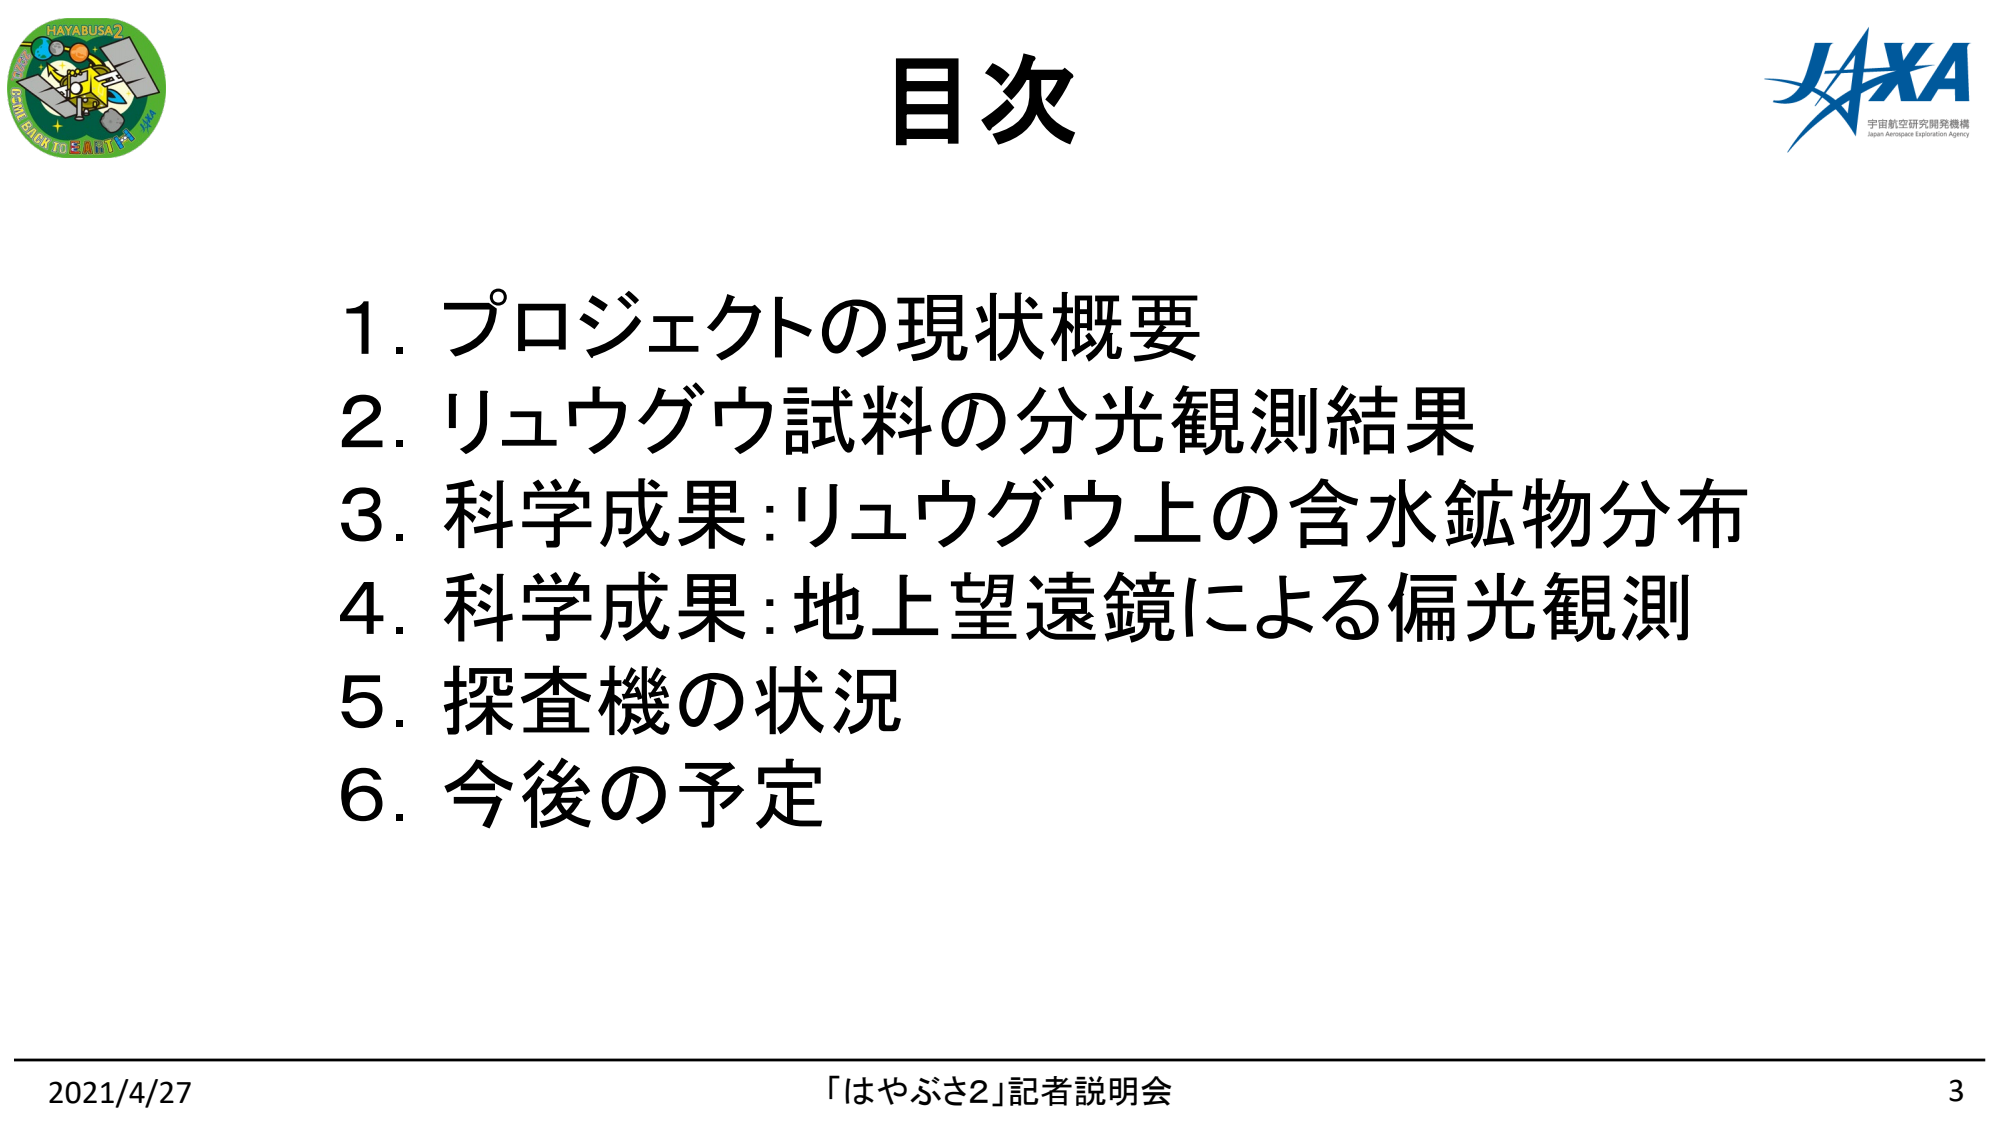 f:id:Imamura:20210427135102p:plain